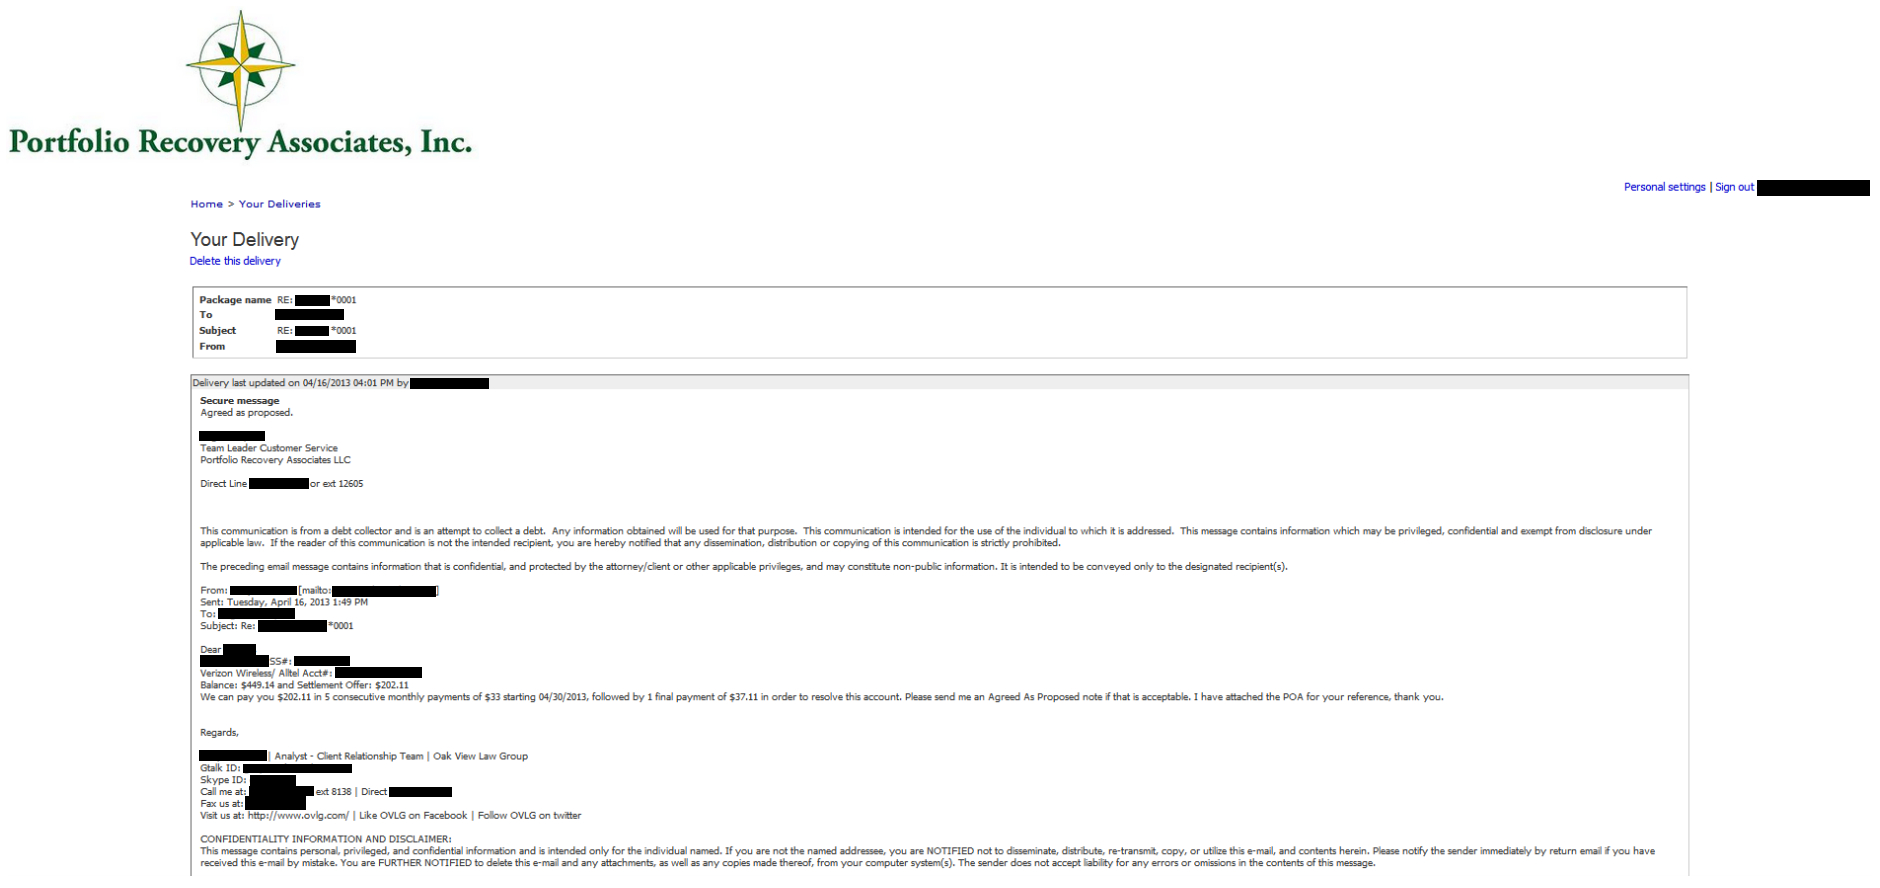 Saved $185.27 with Verizon Wireless/ Alltel for Client PB2